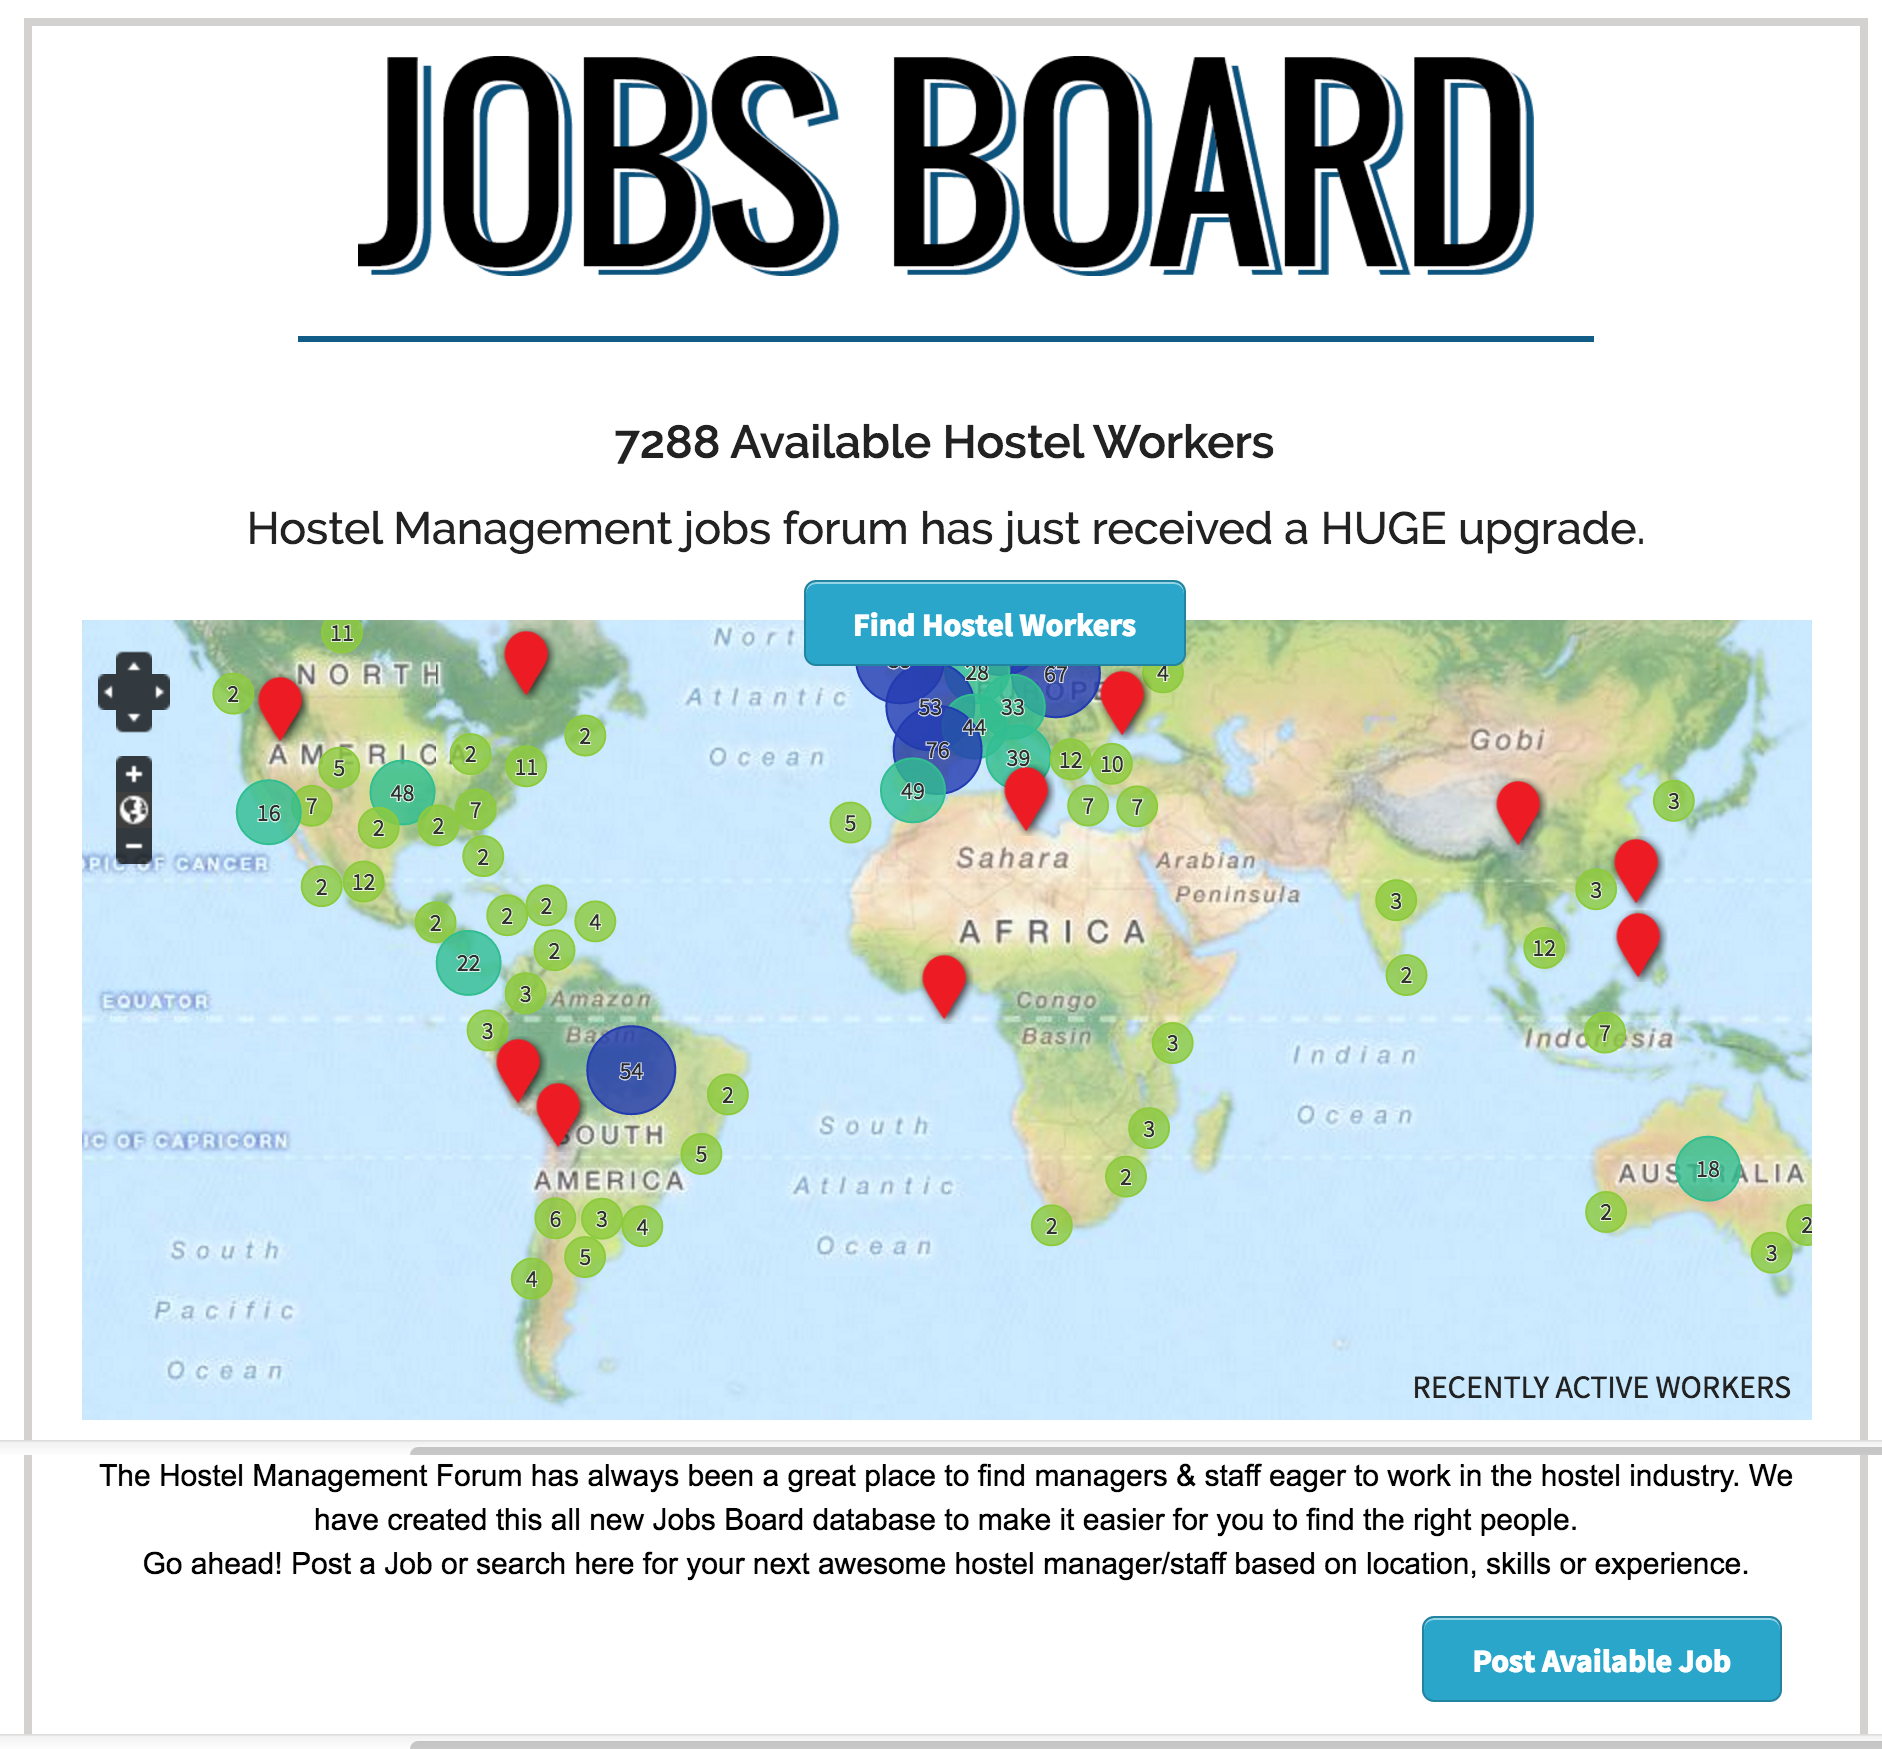 Hostel Management Jobs Board Screenshot with Map